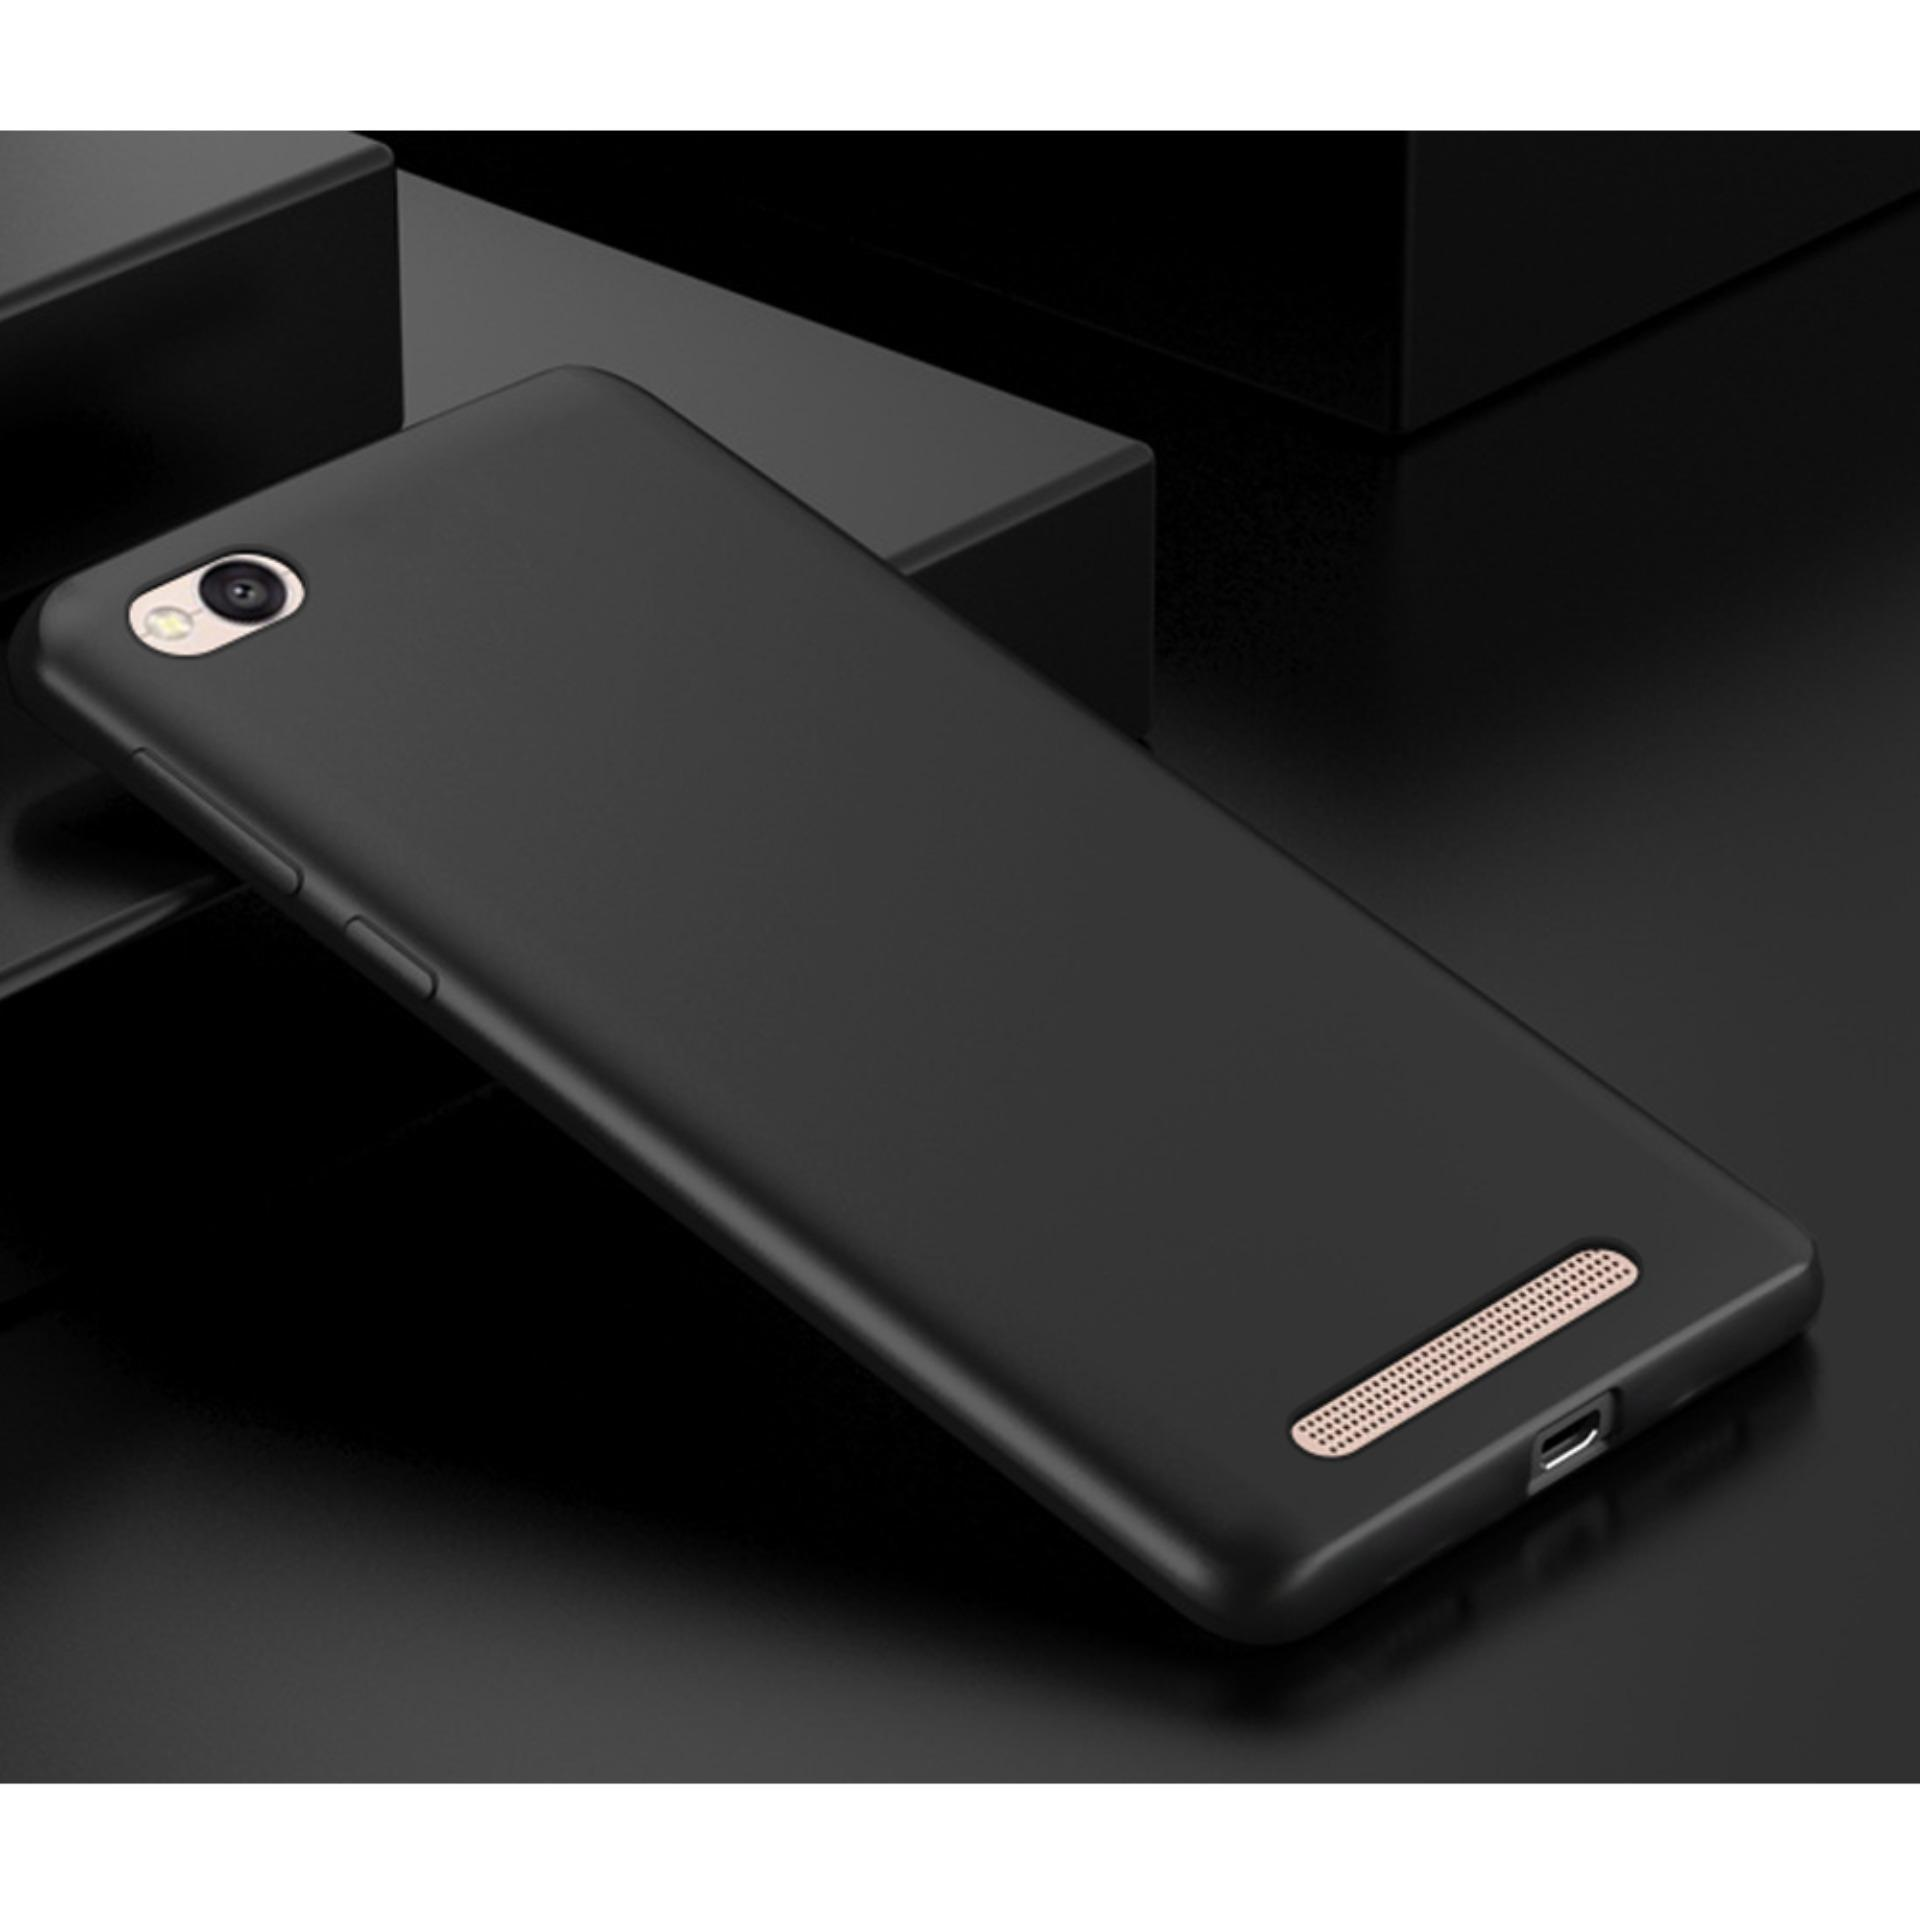 Case Slim Black Matte Xiaomi Redmi 5A Baby Skin Softcase Ultra Thin Jelly Silikon Babyskin - 2